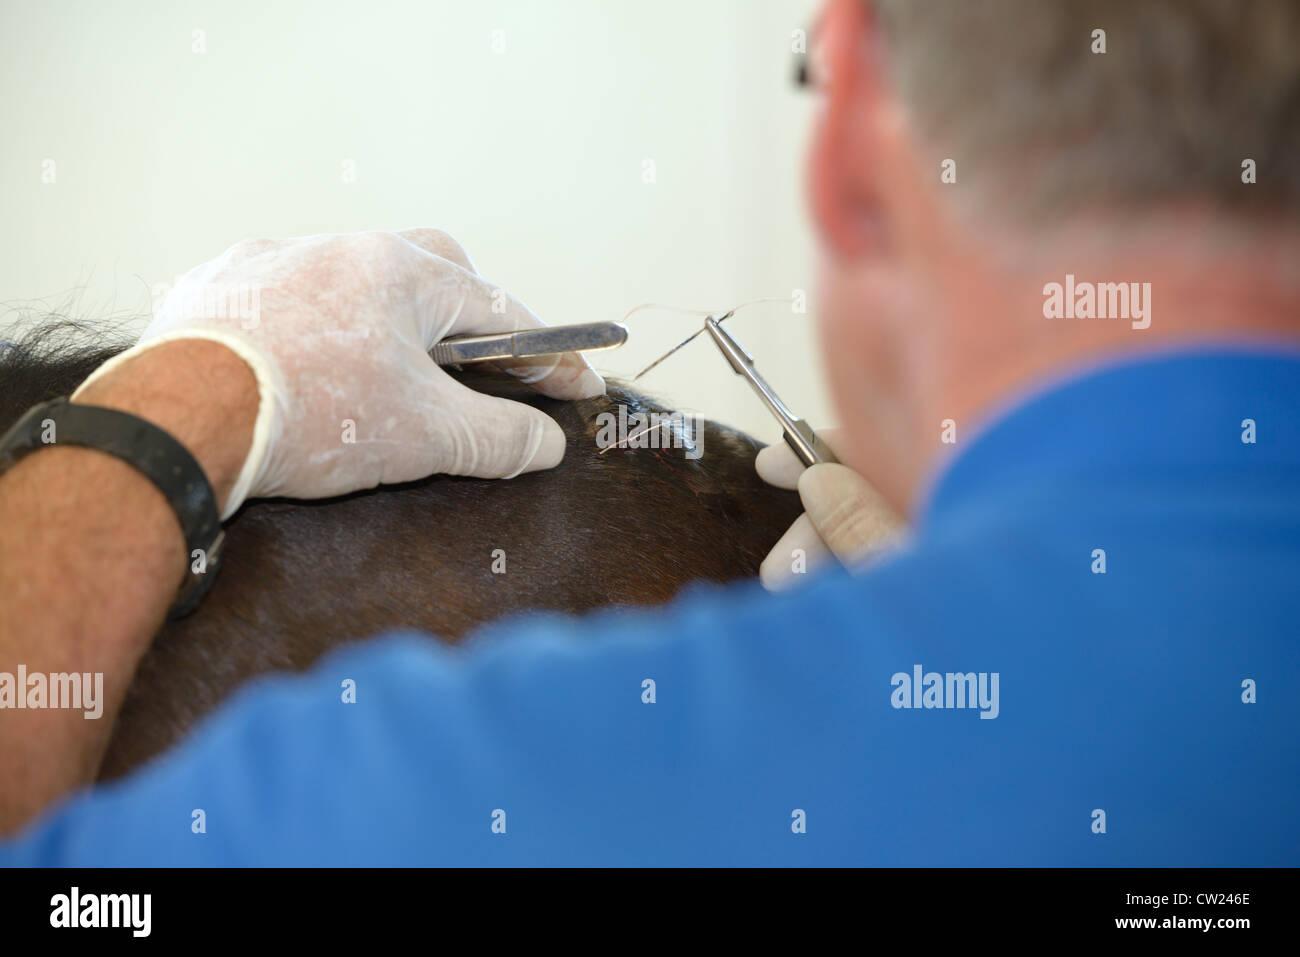 Vétérinaire Cheval Cheval une profonde coupure sur le garrot d'un cheval de race Thoroughbred bay Photo Stock